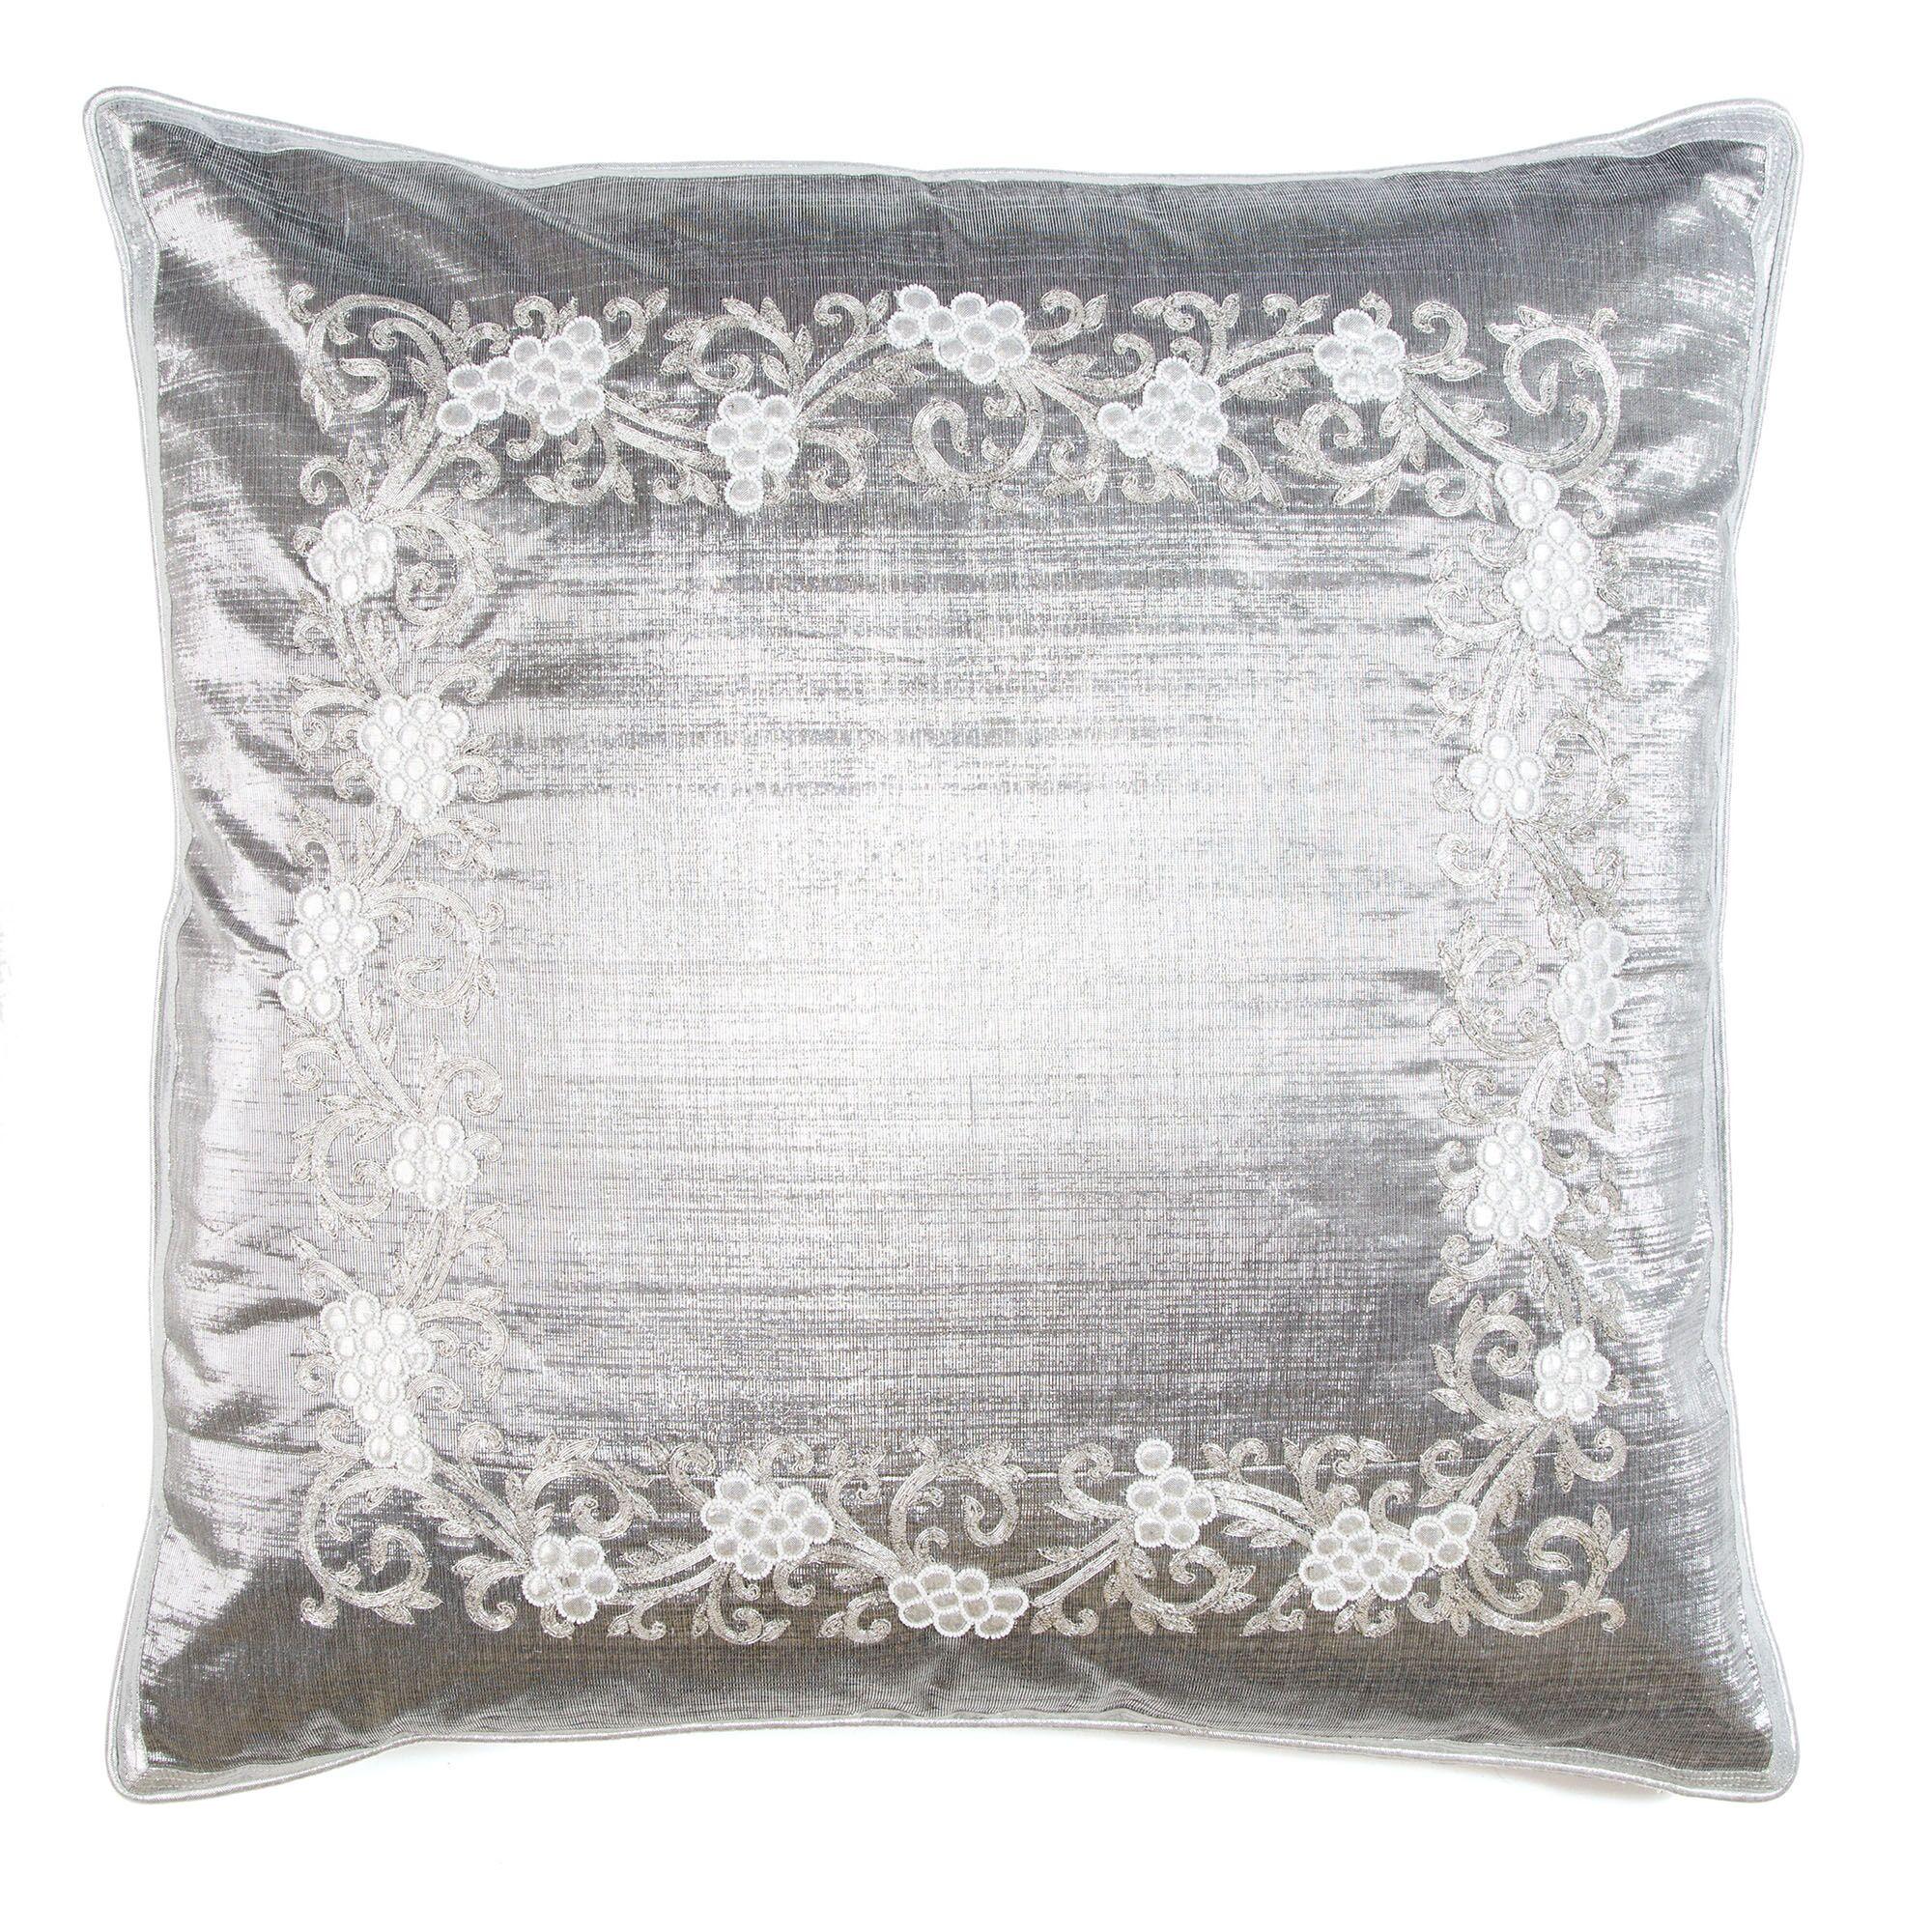 Grape Vine Border Throw Pillow